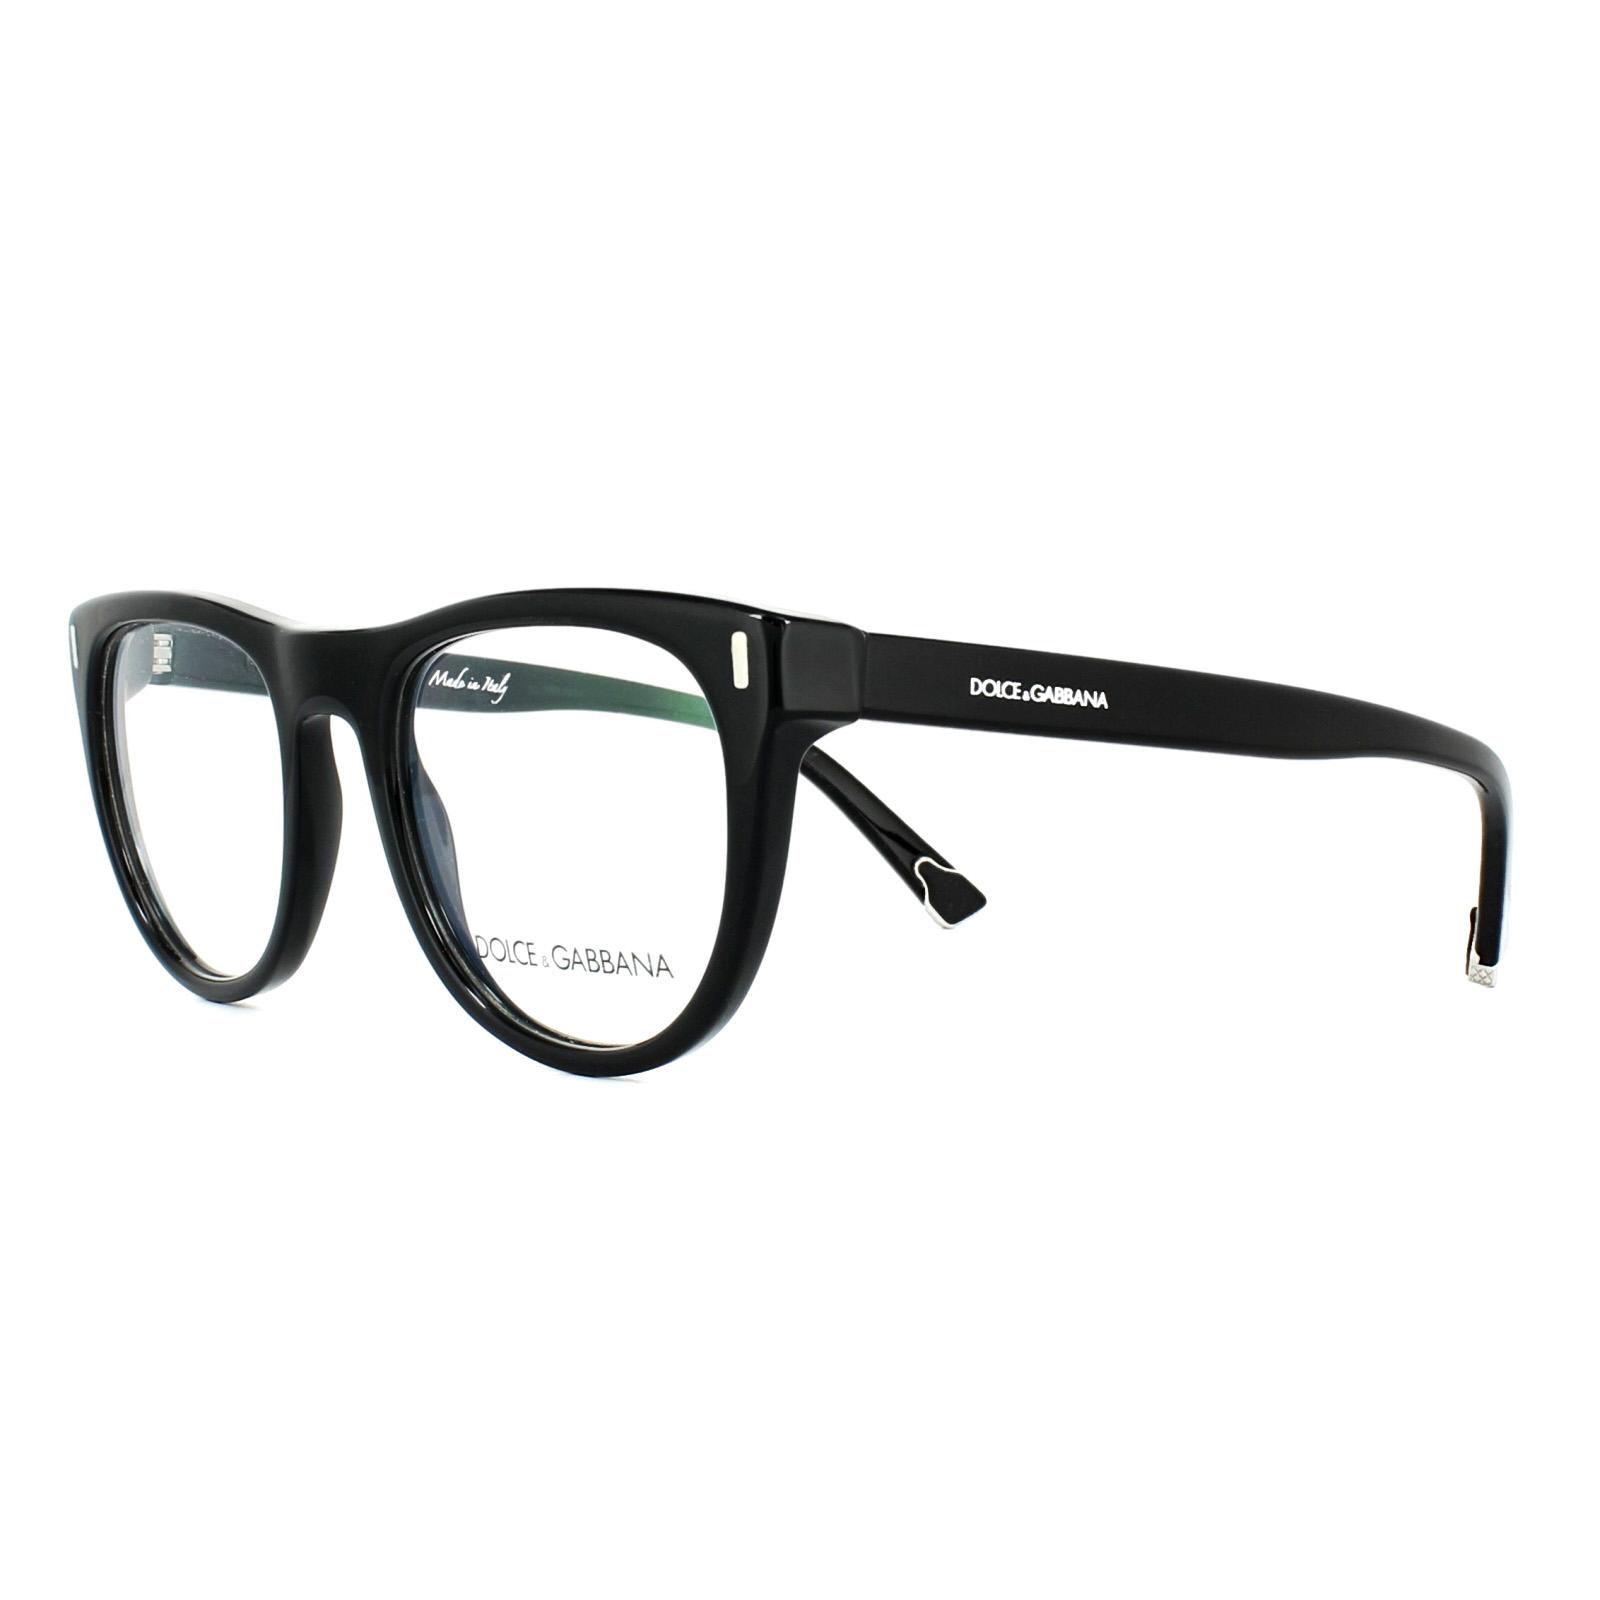 51148a30f6 Sentinel Dolce   Gabbana Glasses Frames DG 3248 501 Black 52mm Mens